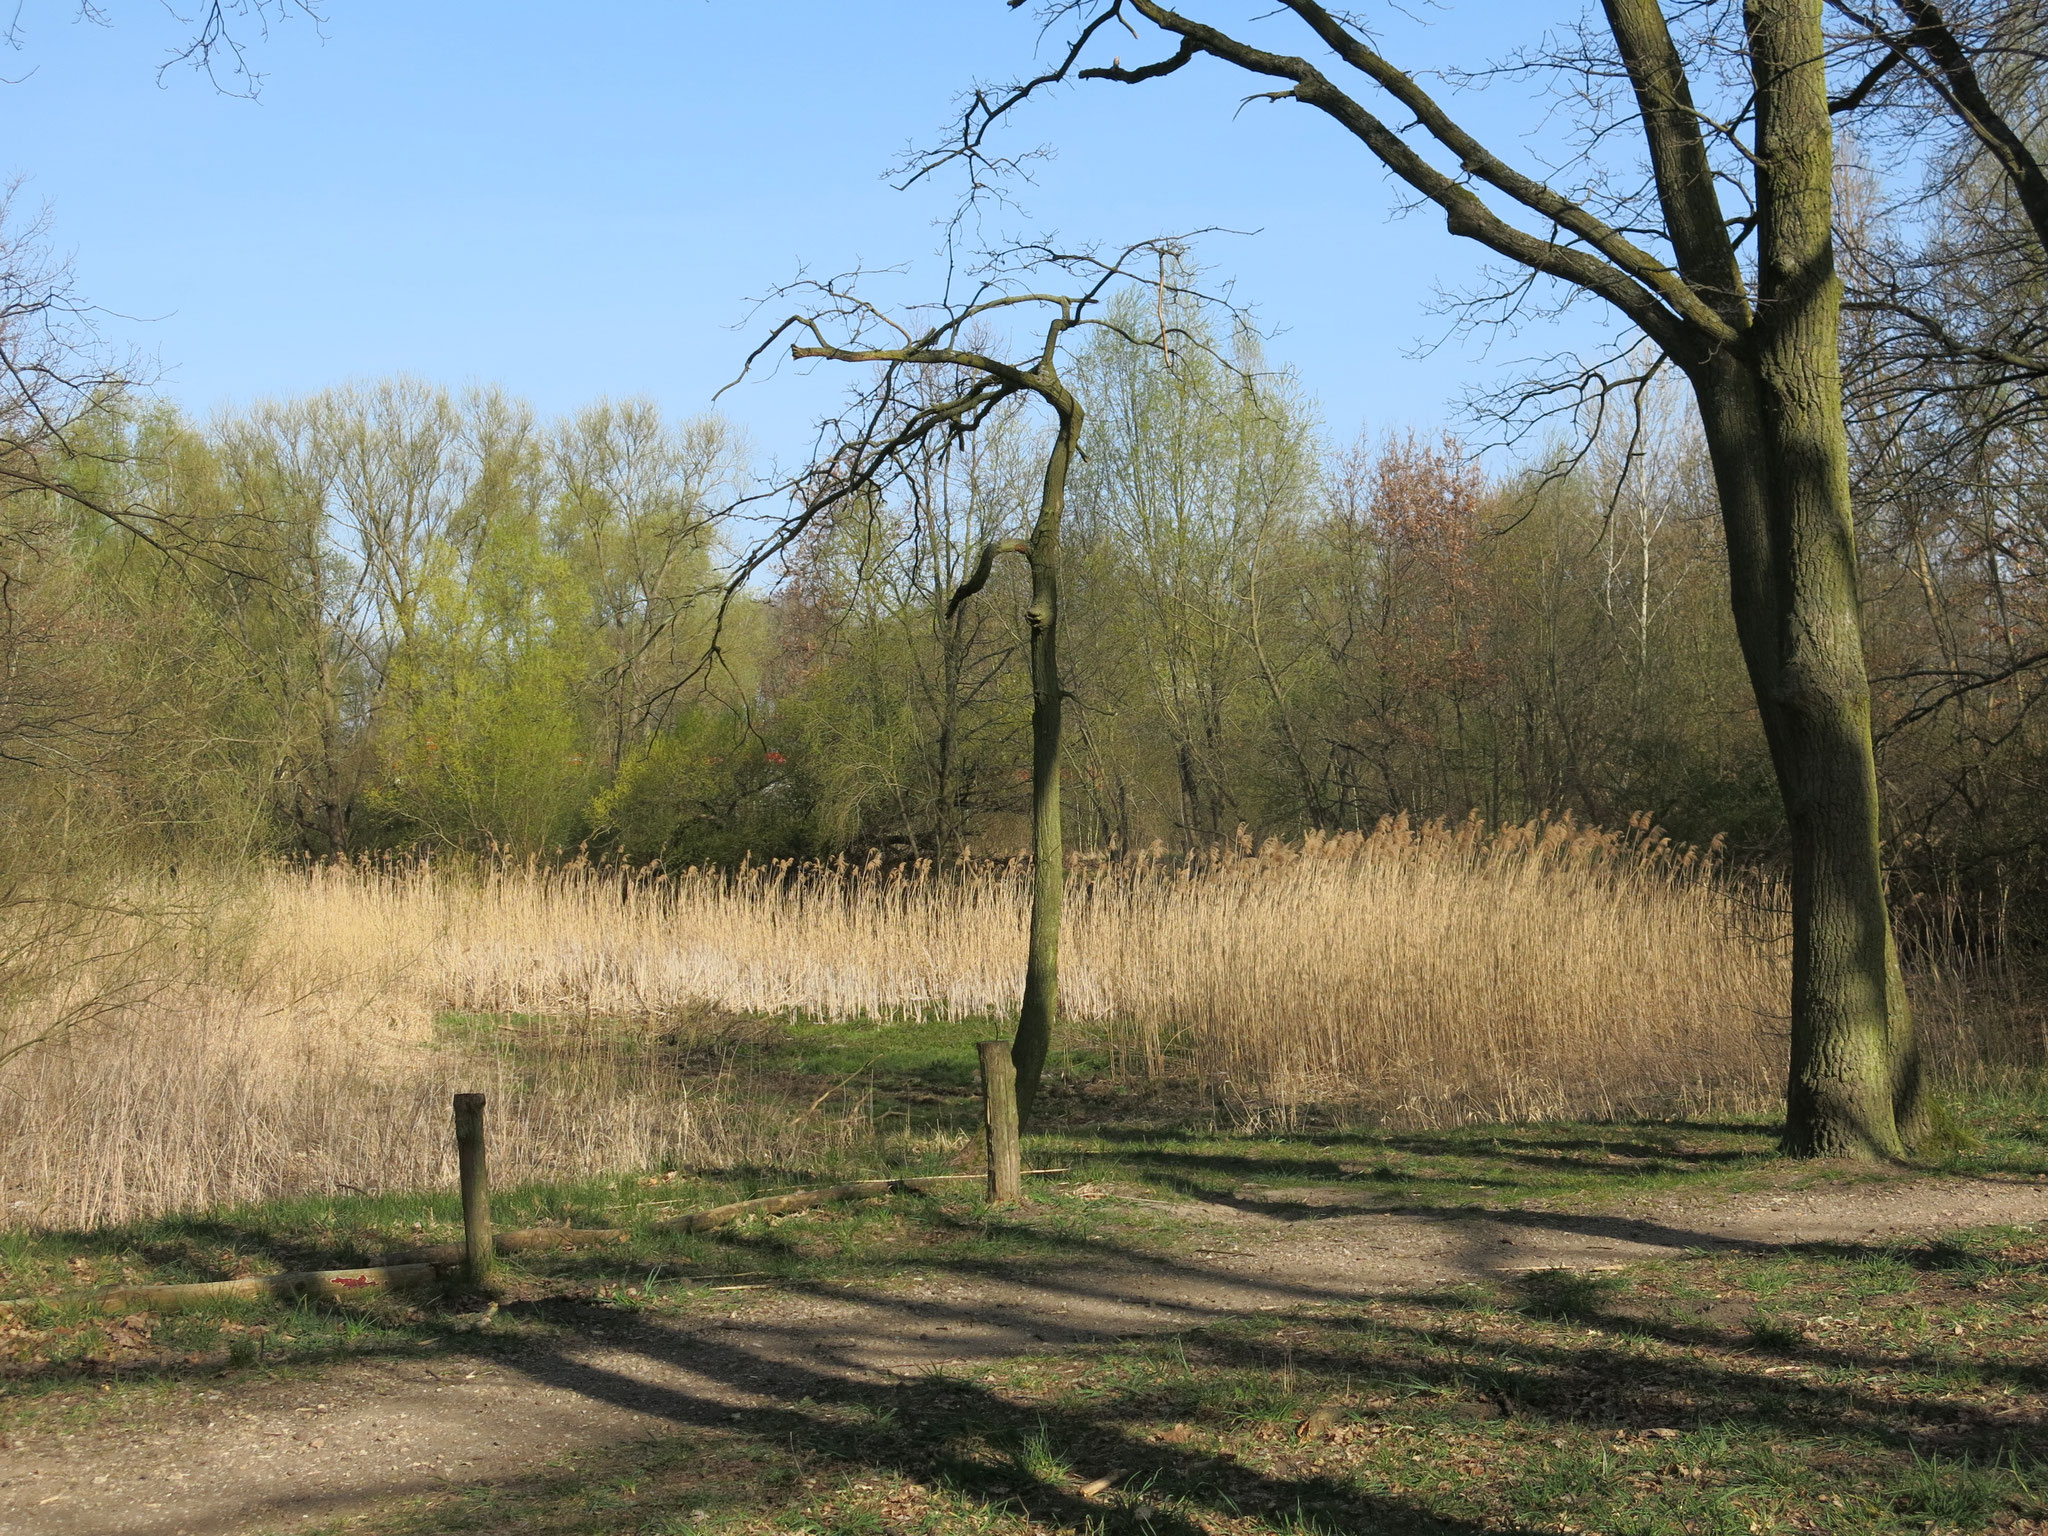 Tipp 3: Wuhle-Hönow-Weg, Beerenpfuhl